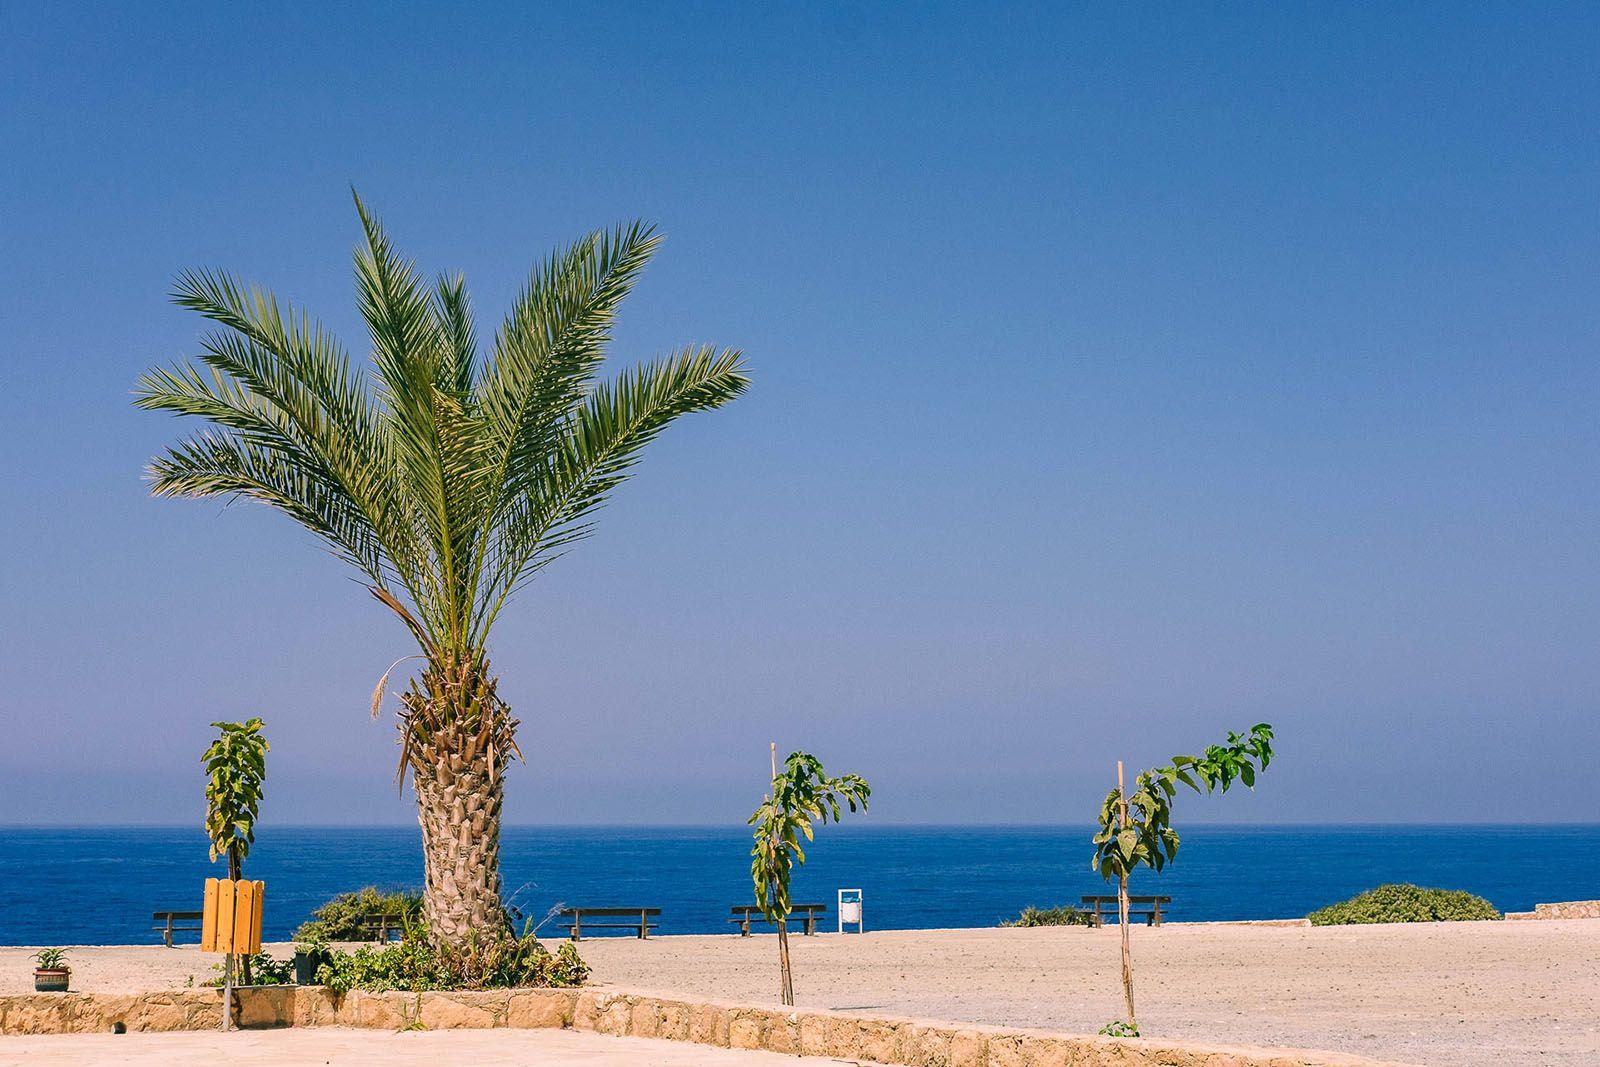 Група пальм на пляжі